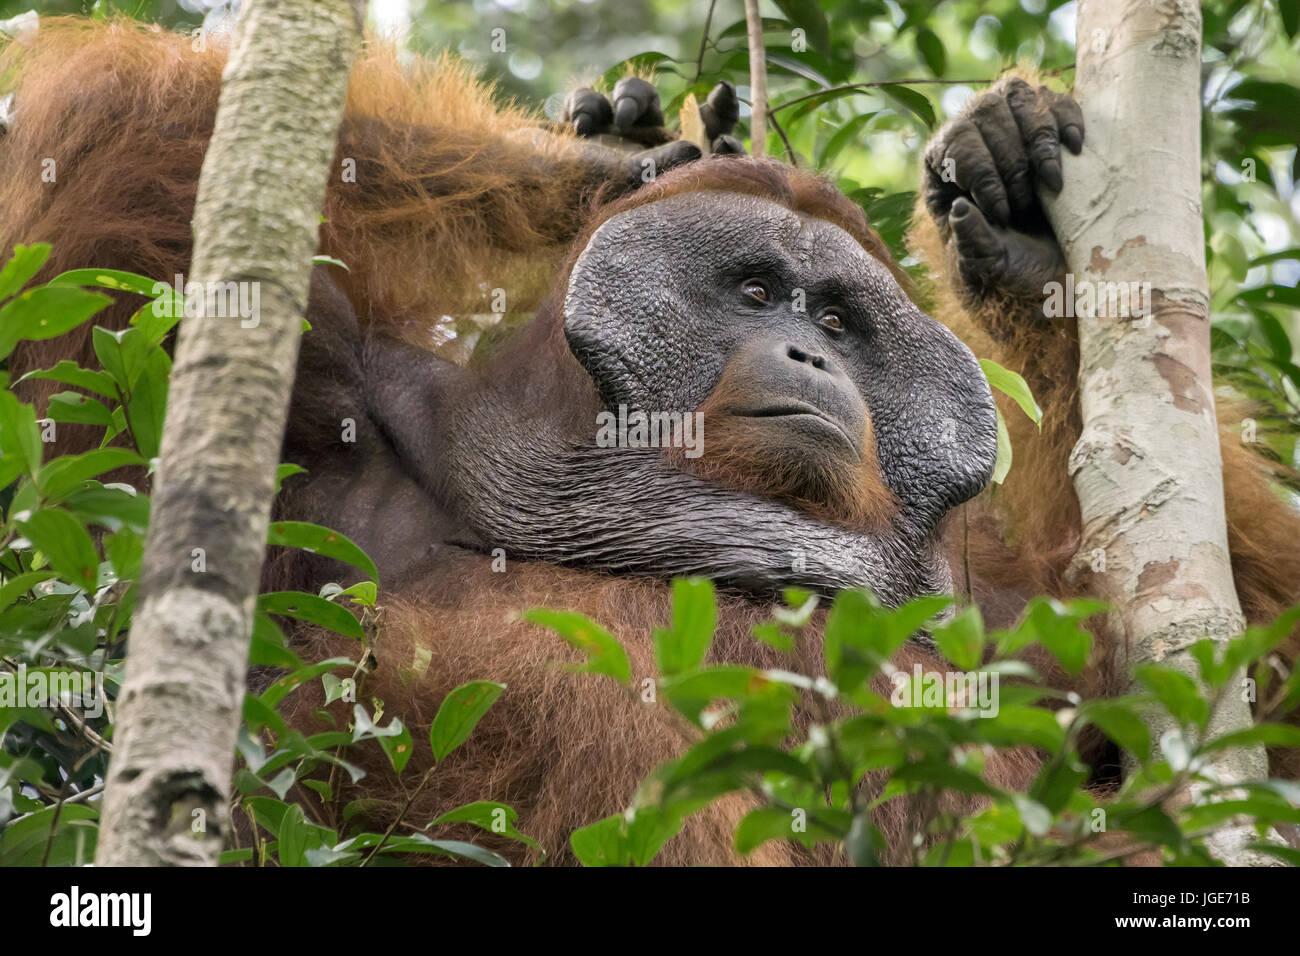 Flanged male orangutan relaxing in a tree, Tanjung Puting National Park, Kalimantan, Indonesia - Stock Image